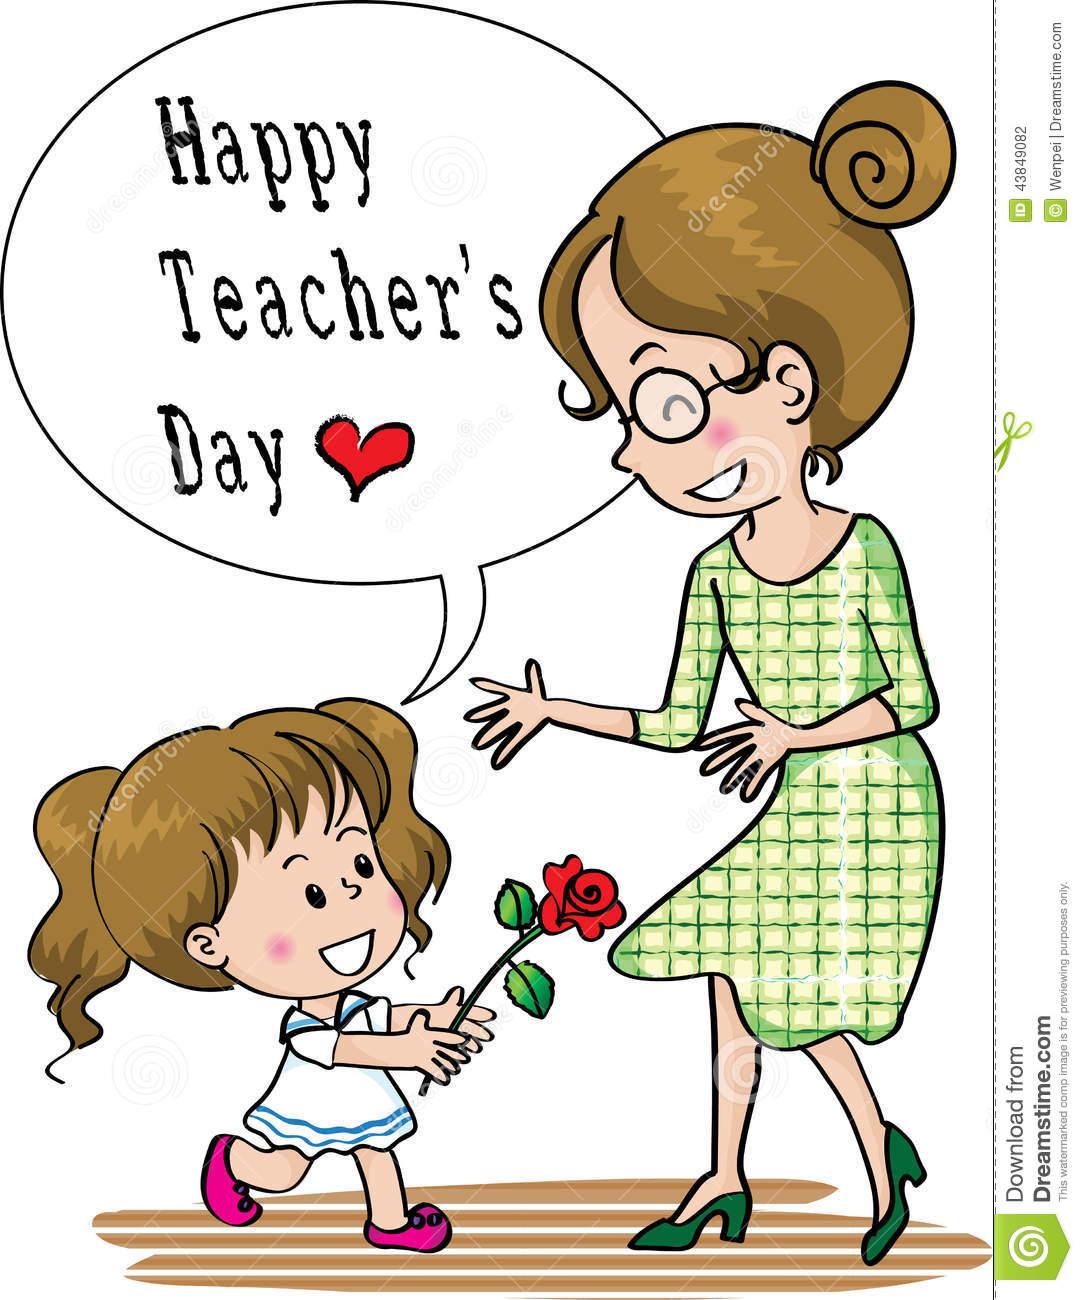 Teachers day clipart 2 » Clipart Station.